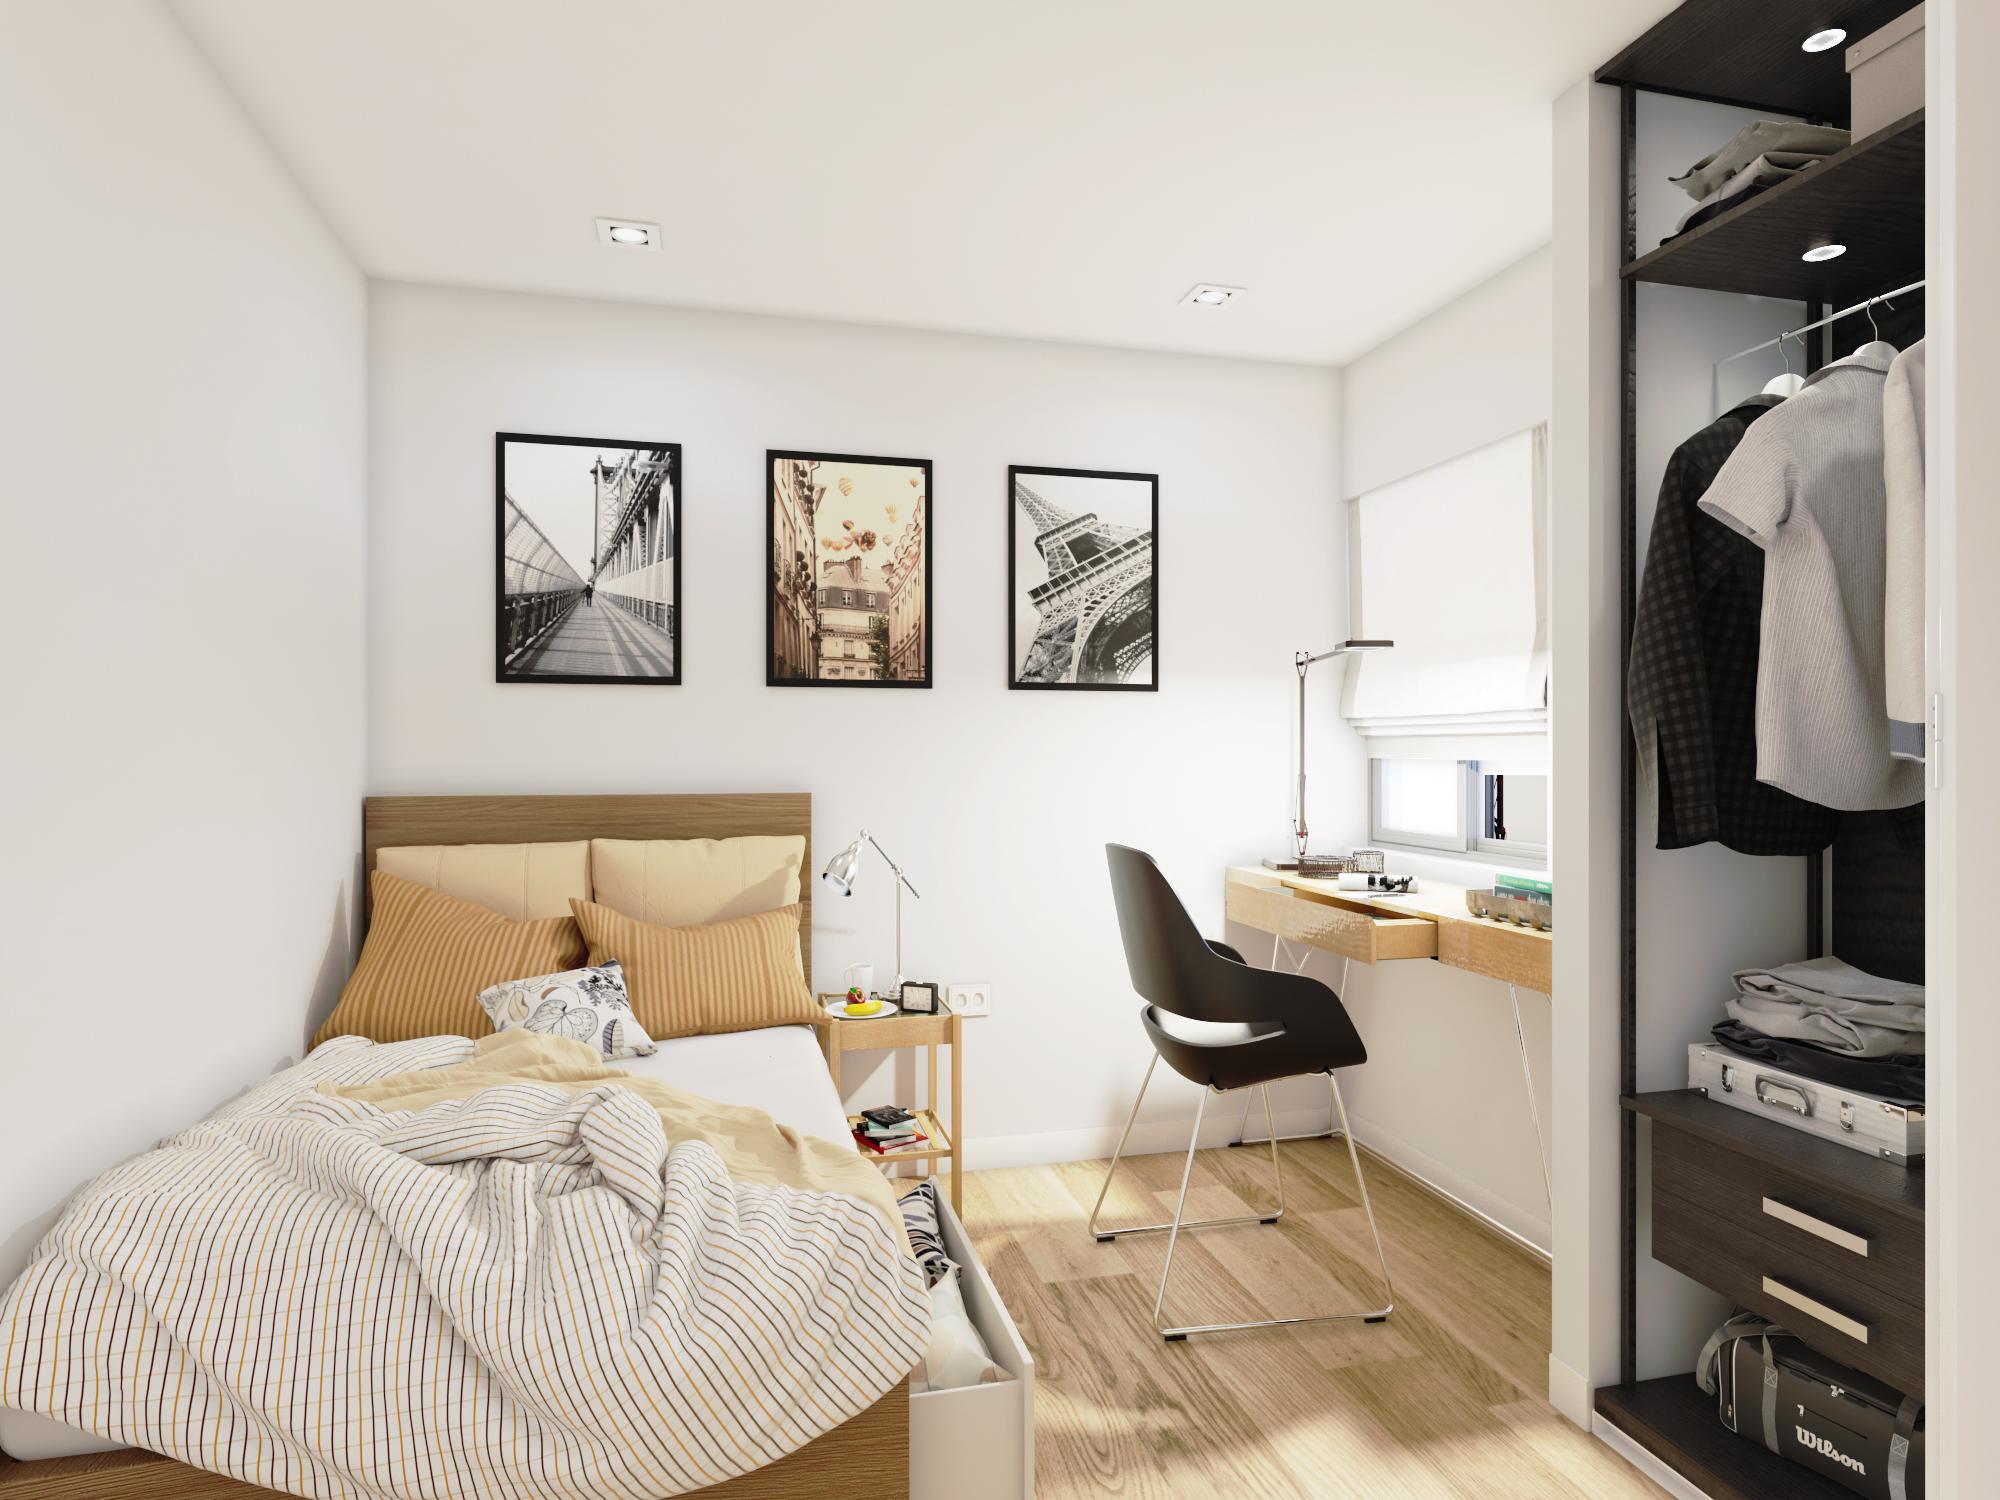 2, 2 Bedrooms Bedrooms, ,1 BathroomBathrooms,Apartment,For Sale,1133